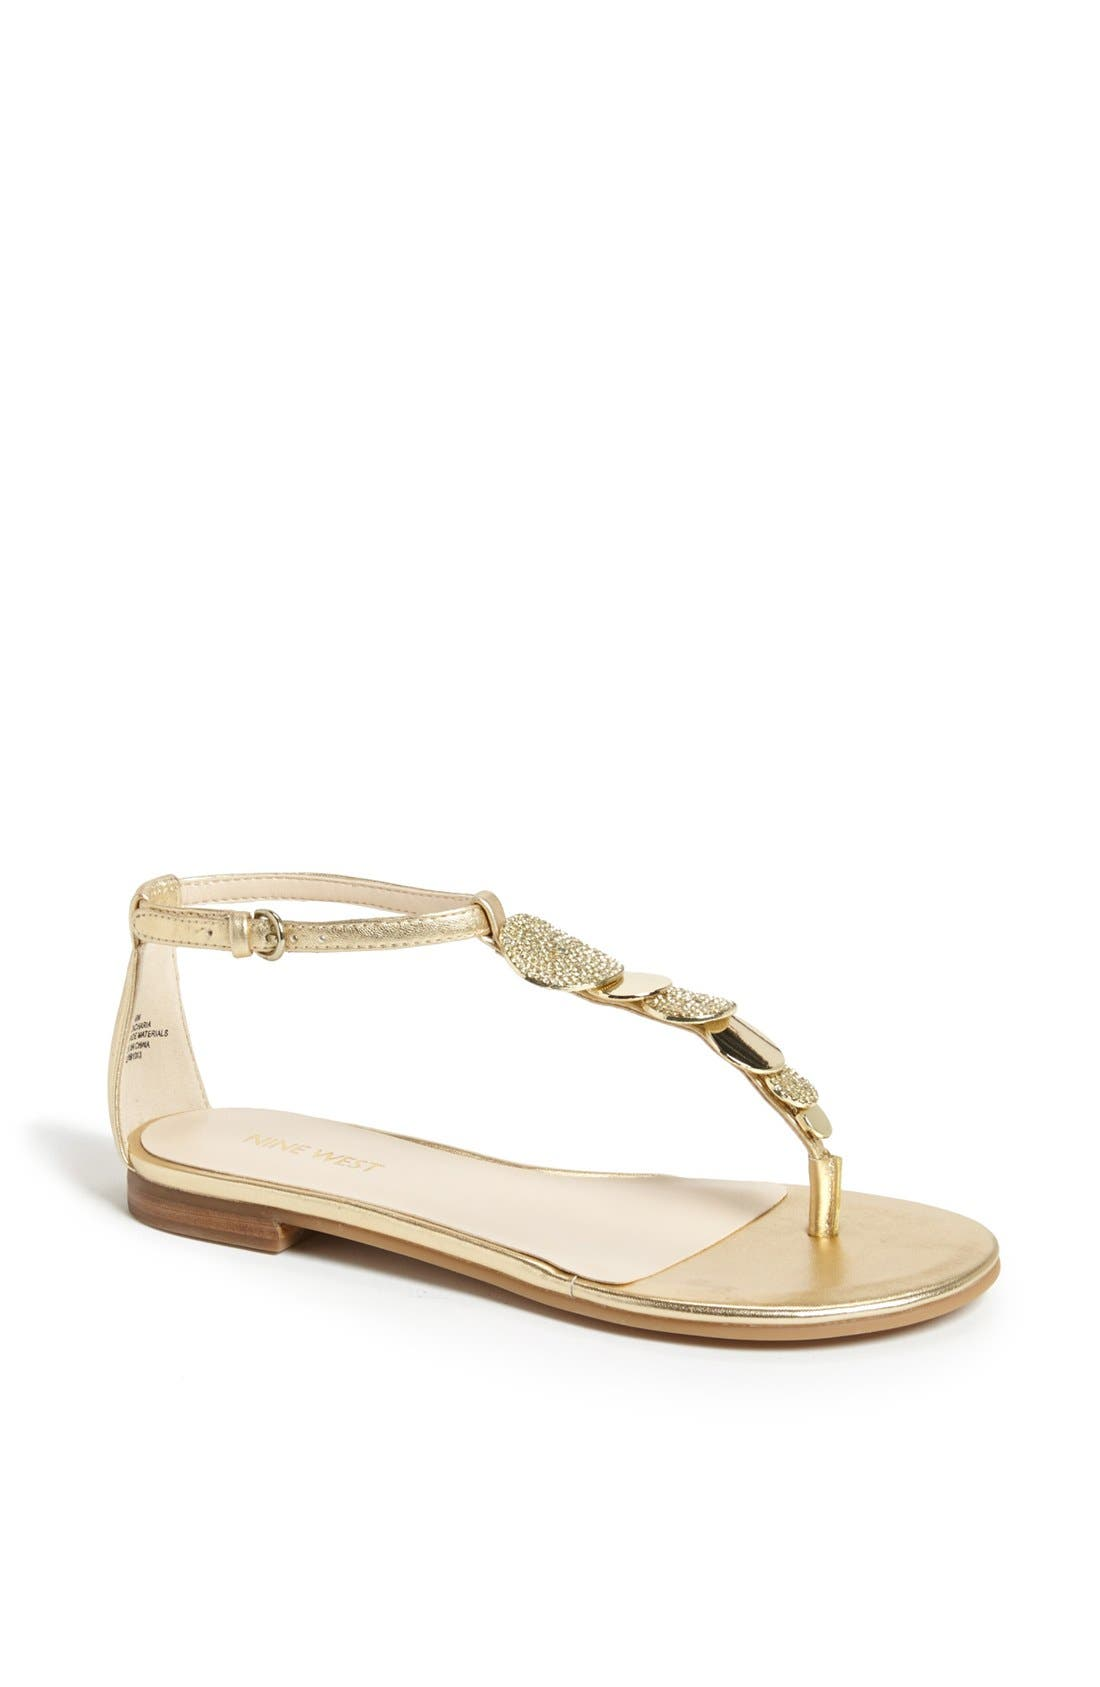 Alternate Image 1 Selected - Nine West 'Zacharia' Thong Sandal